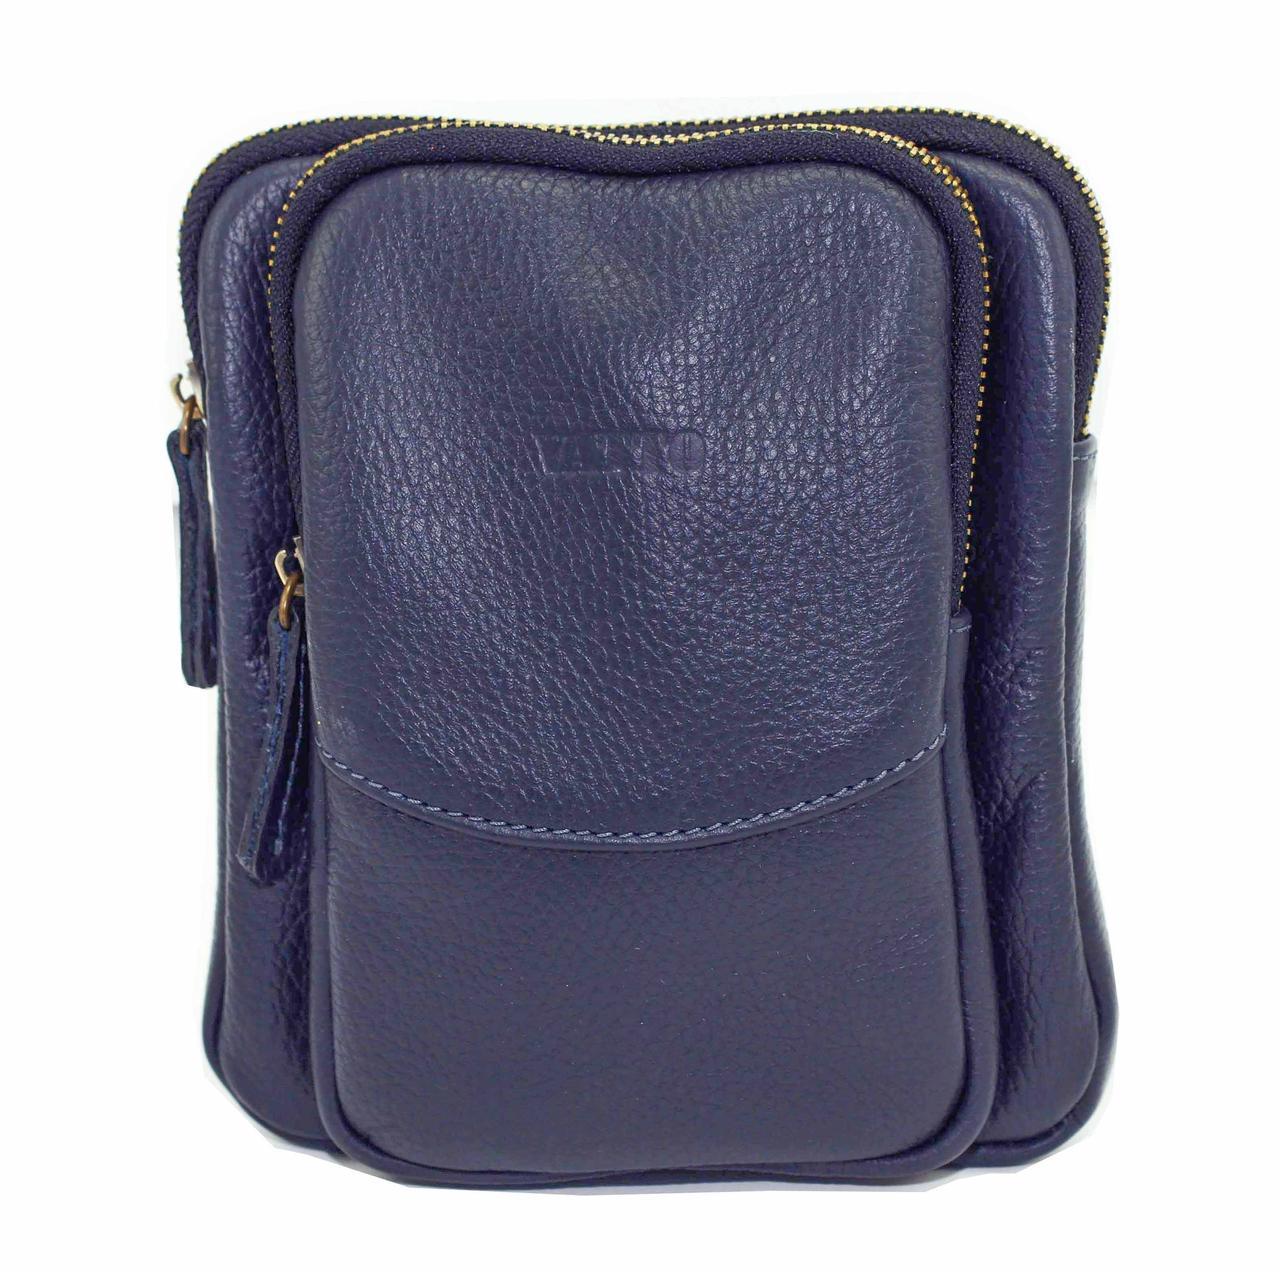 Синяя мужская сумка Vatto Mk12 F1 (Украина)